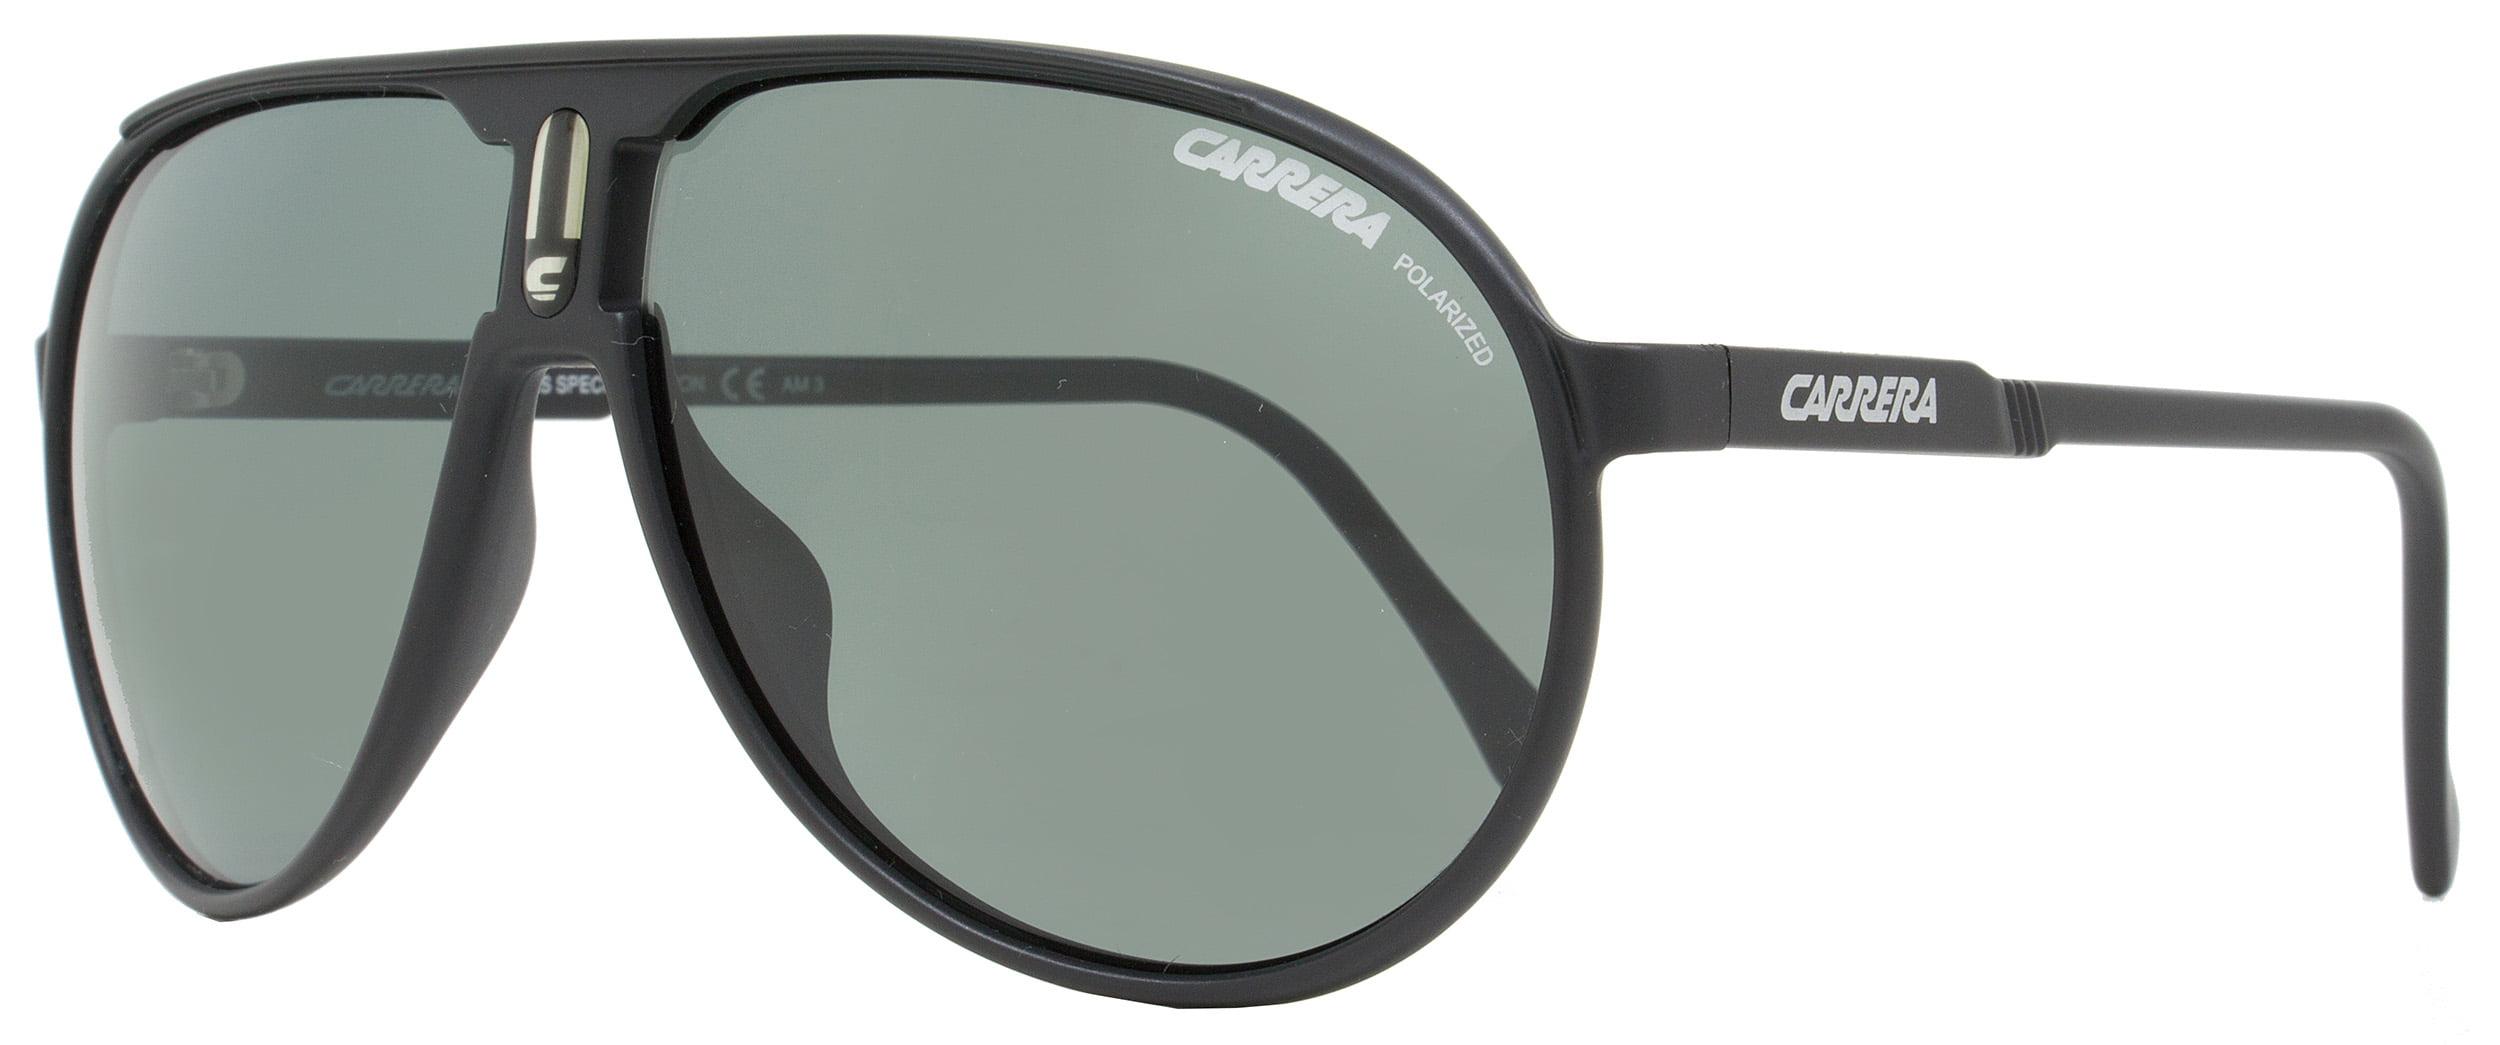 a309231b13 Carrera - Carrera Aviator Sunglasses Champion L DL5Y2 Matte Black Polarized  - Walmart.com